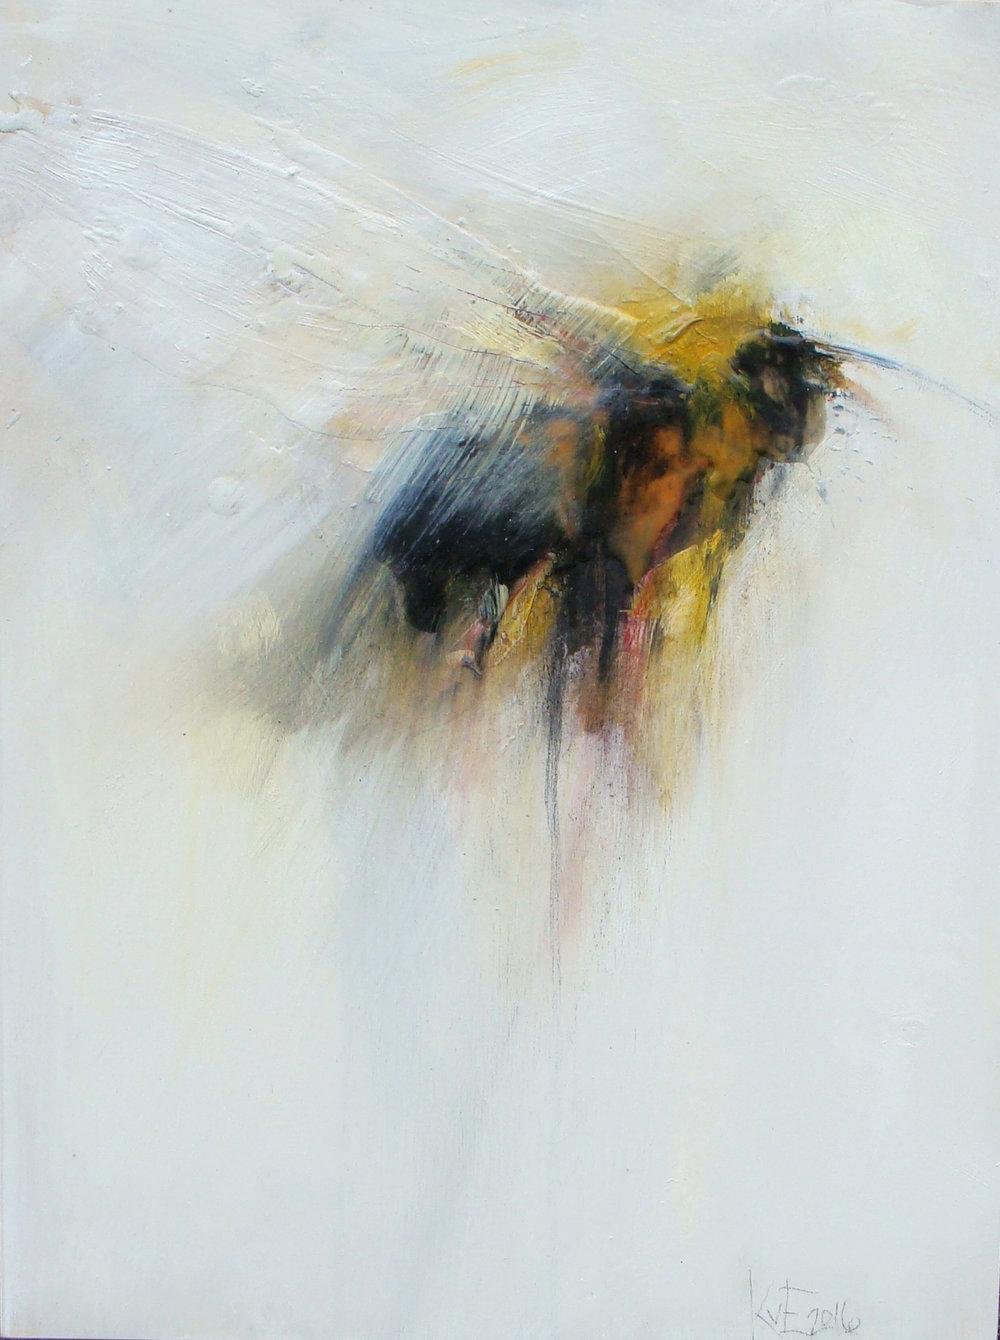 "black sheep - oil, wax, charcoal on wood panel, 16x12"", 2016, SOLD"